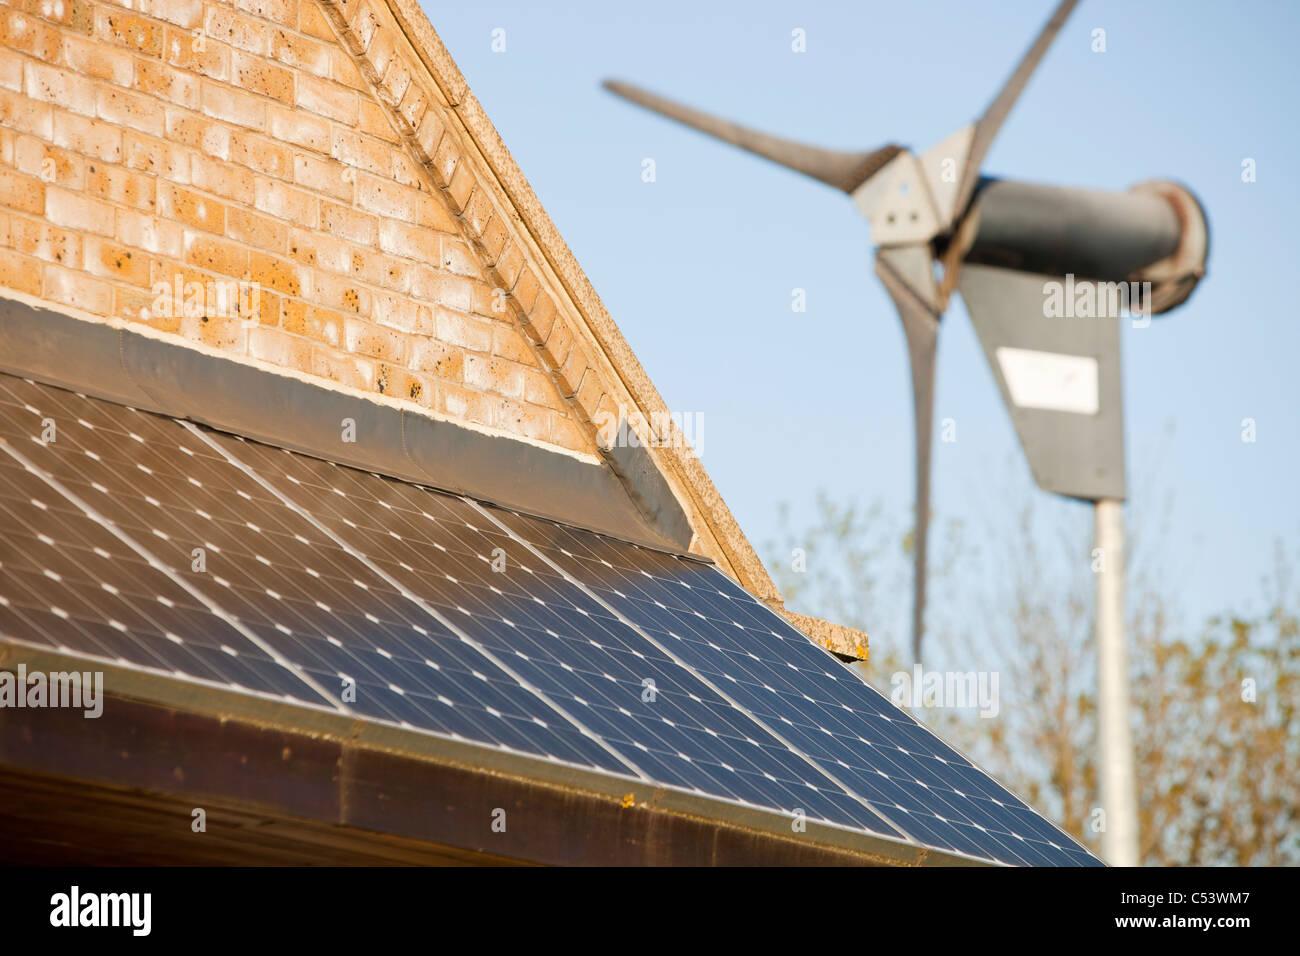 Renewable energy at Cowpen Bewley Woodland Park in Billingham, UK - Stock Image